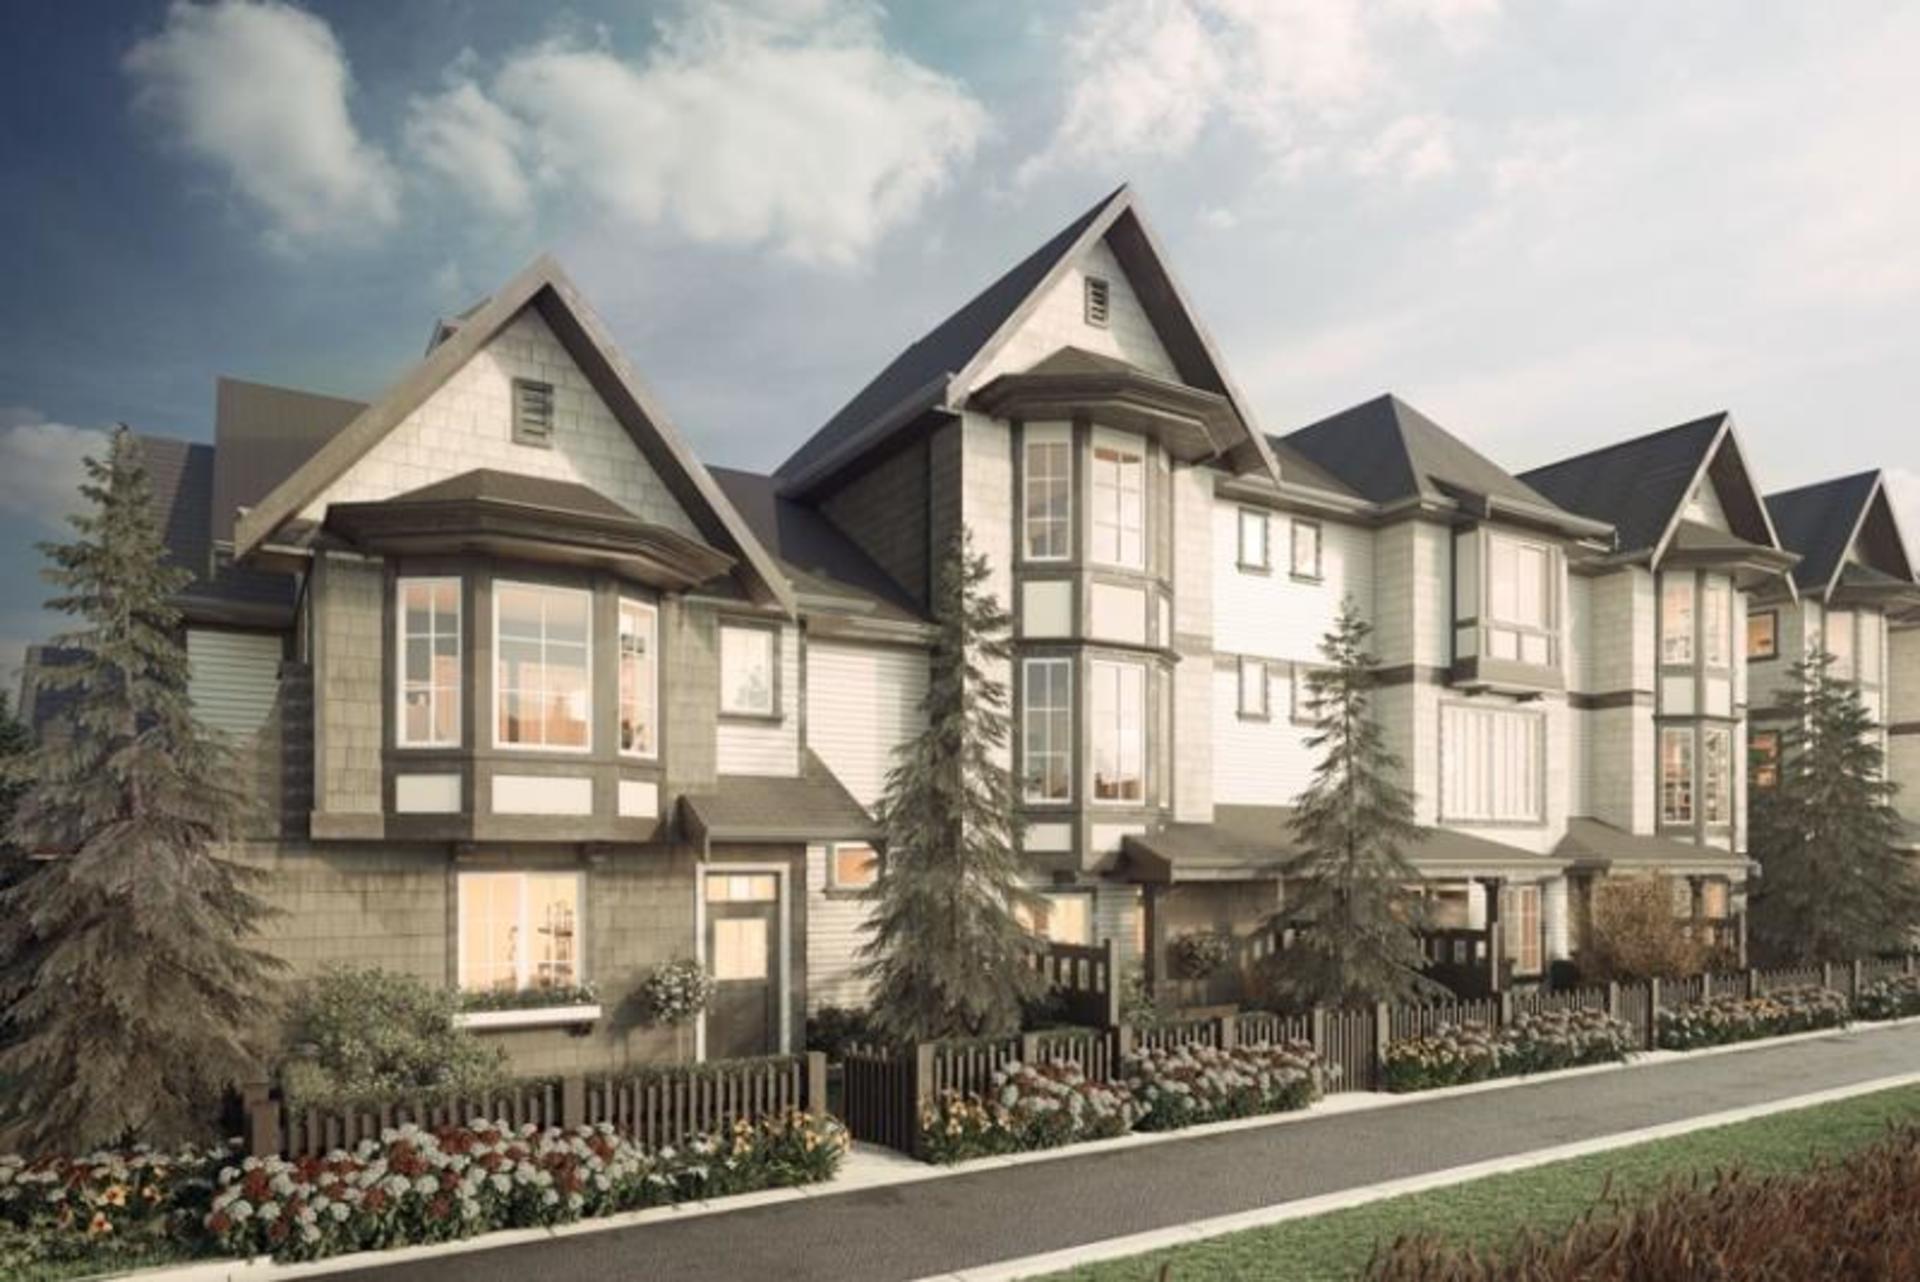 2015_12_23_11_49_26_polygon_homes_langley_ashbury_oak_townhomes_rendering at Ashbury + Oak Townhomes (8138 204th Street, Willoughby Heights, Langley)